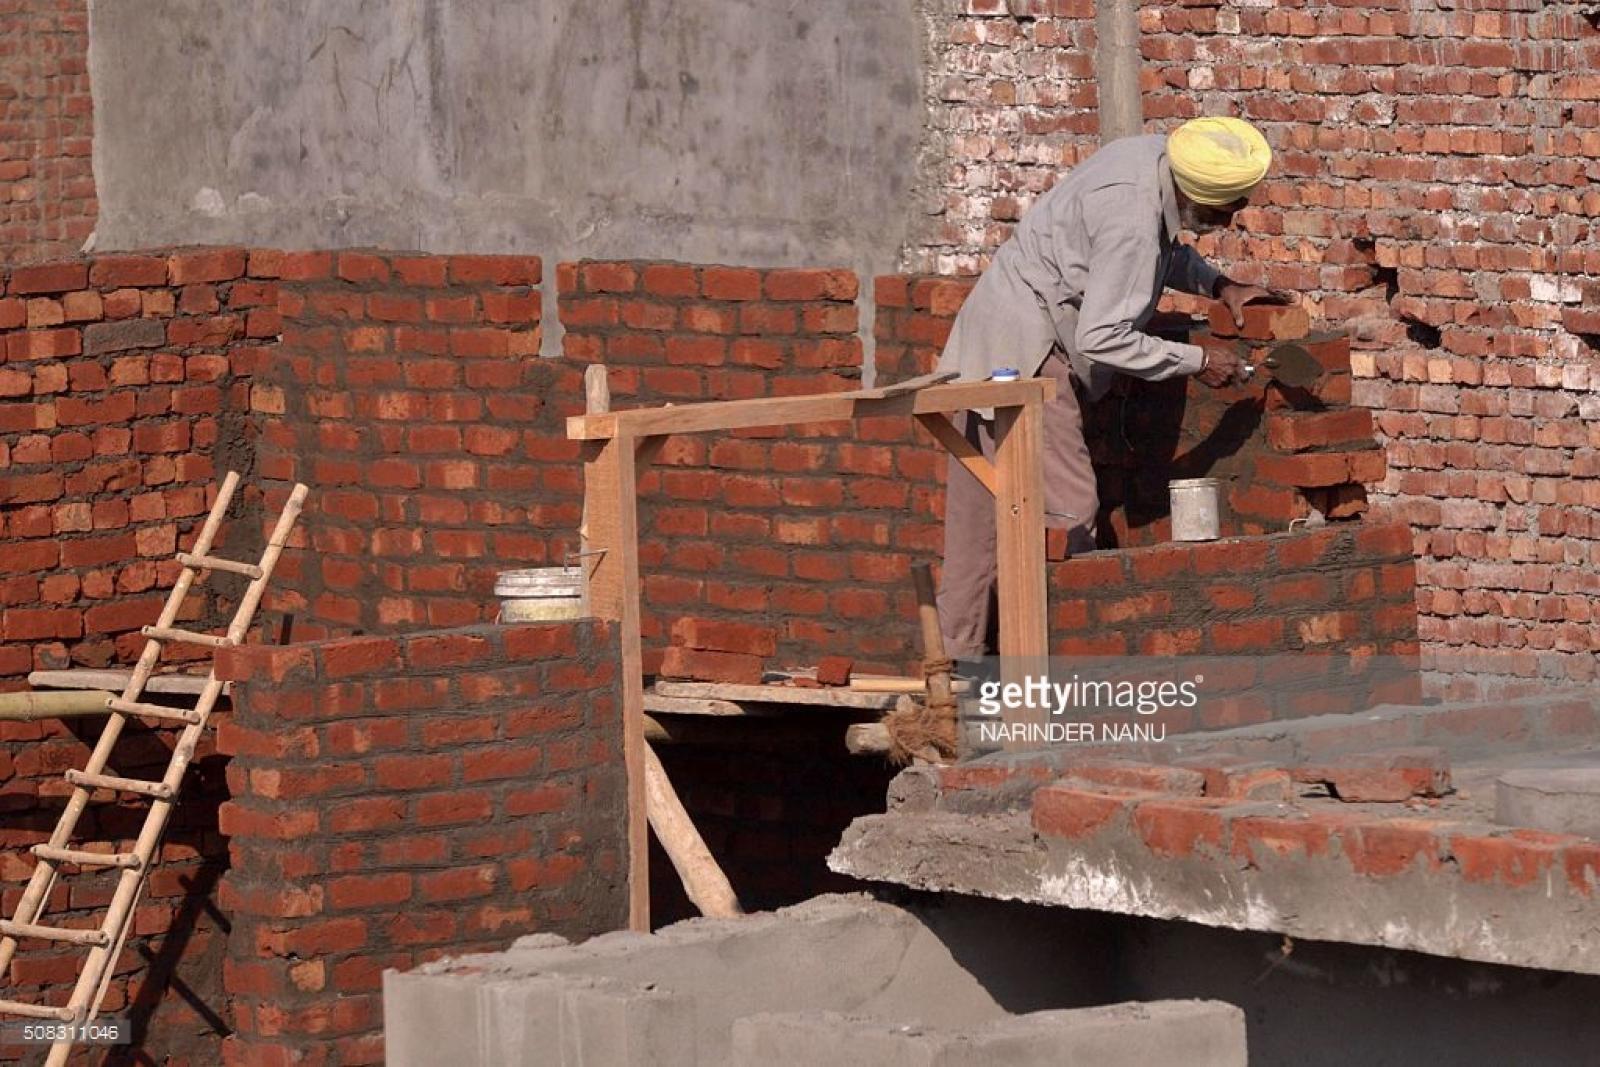 Trimurti Constructions